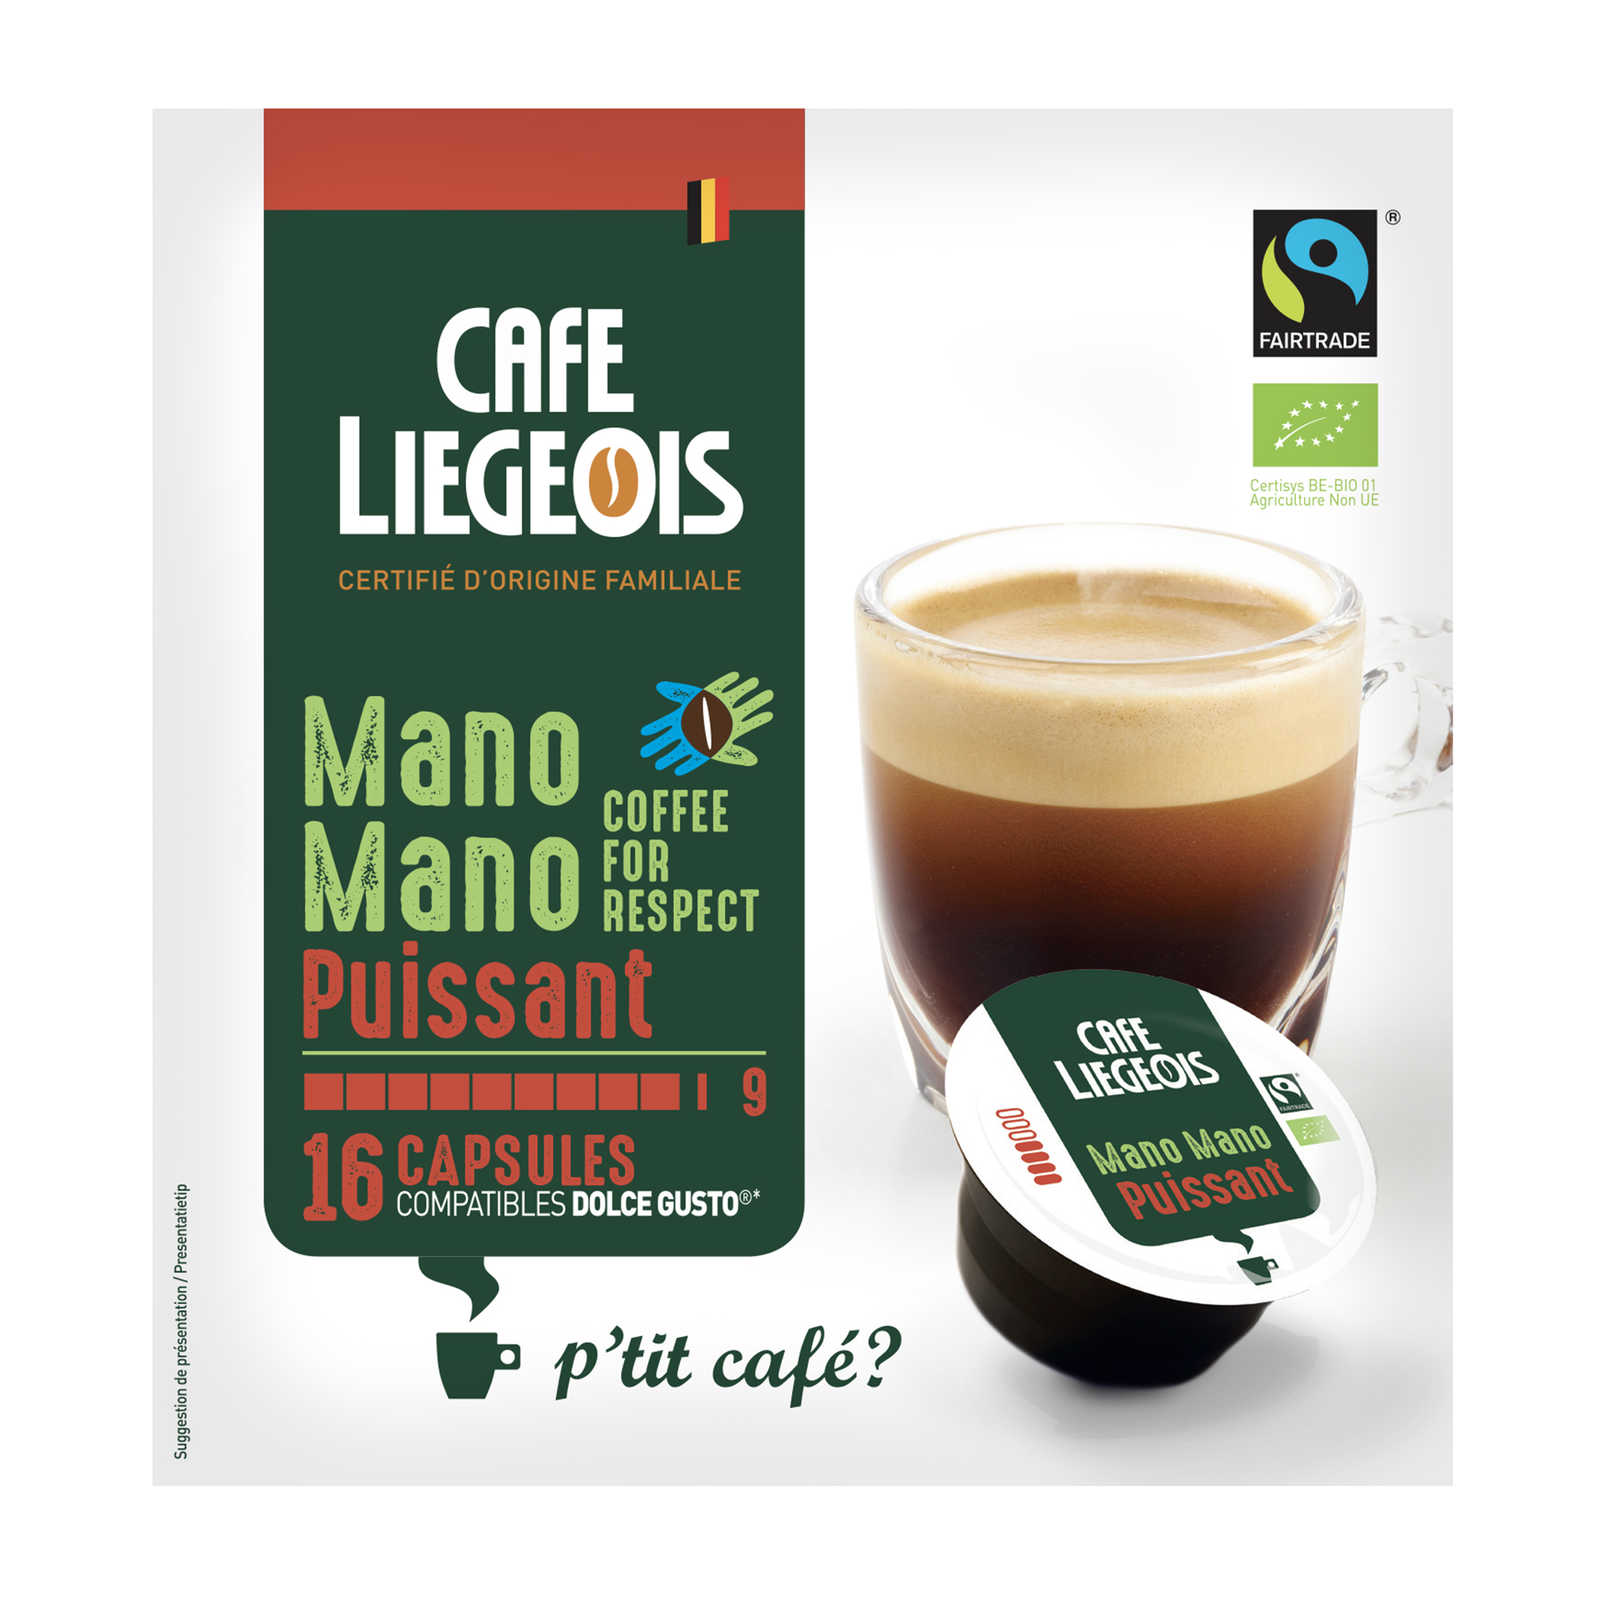 Charles Liégeois-Mano Mano